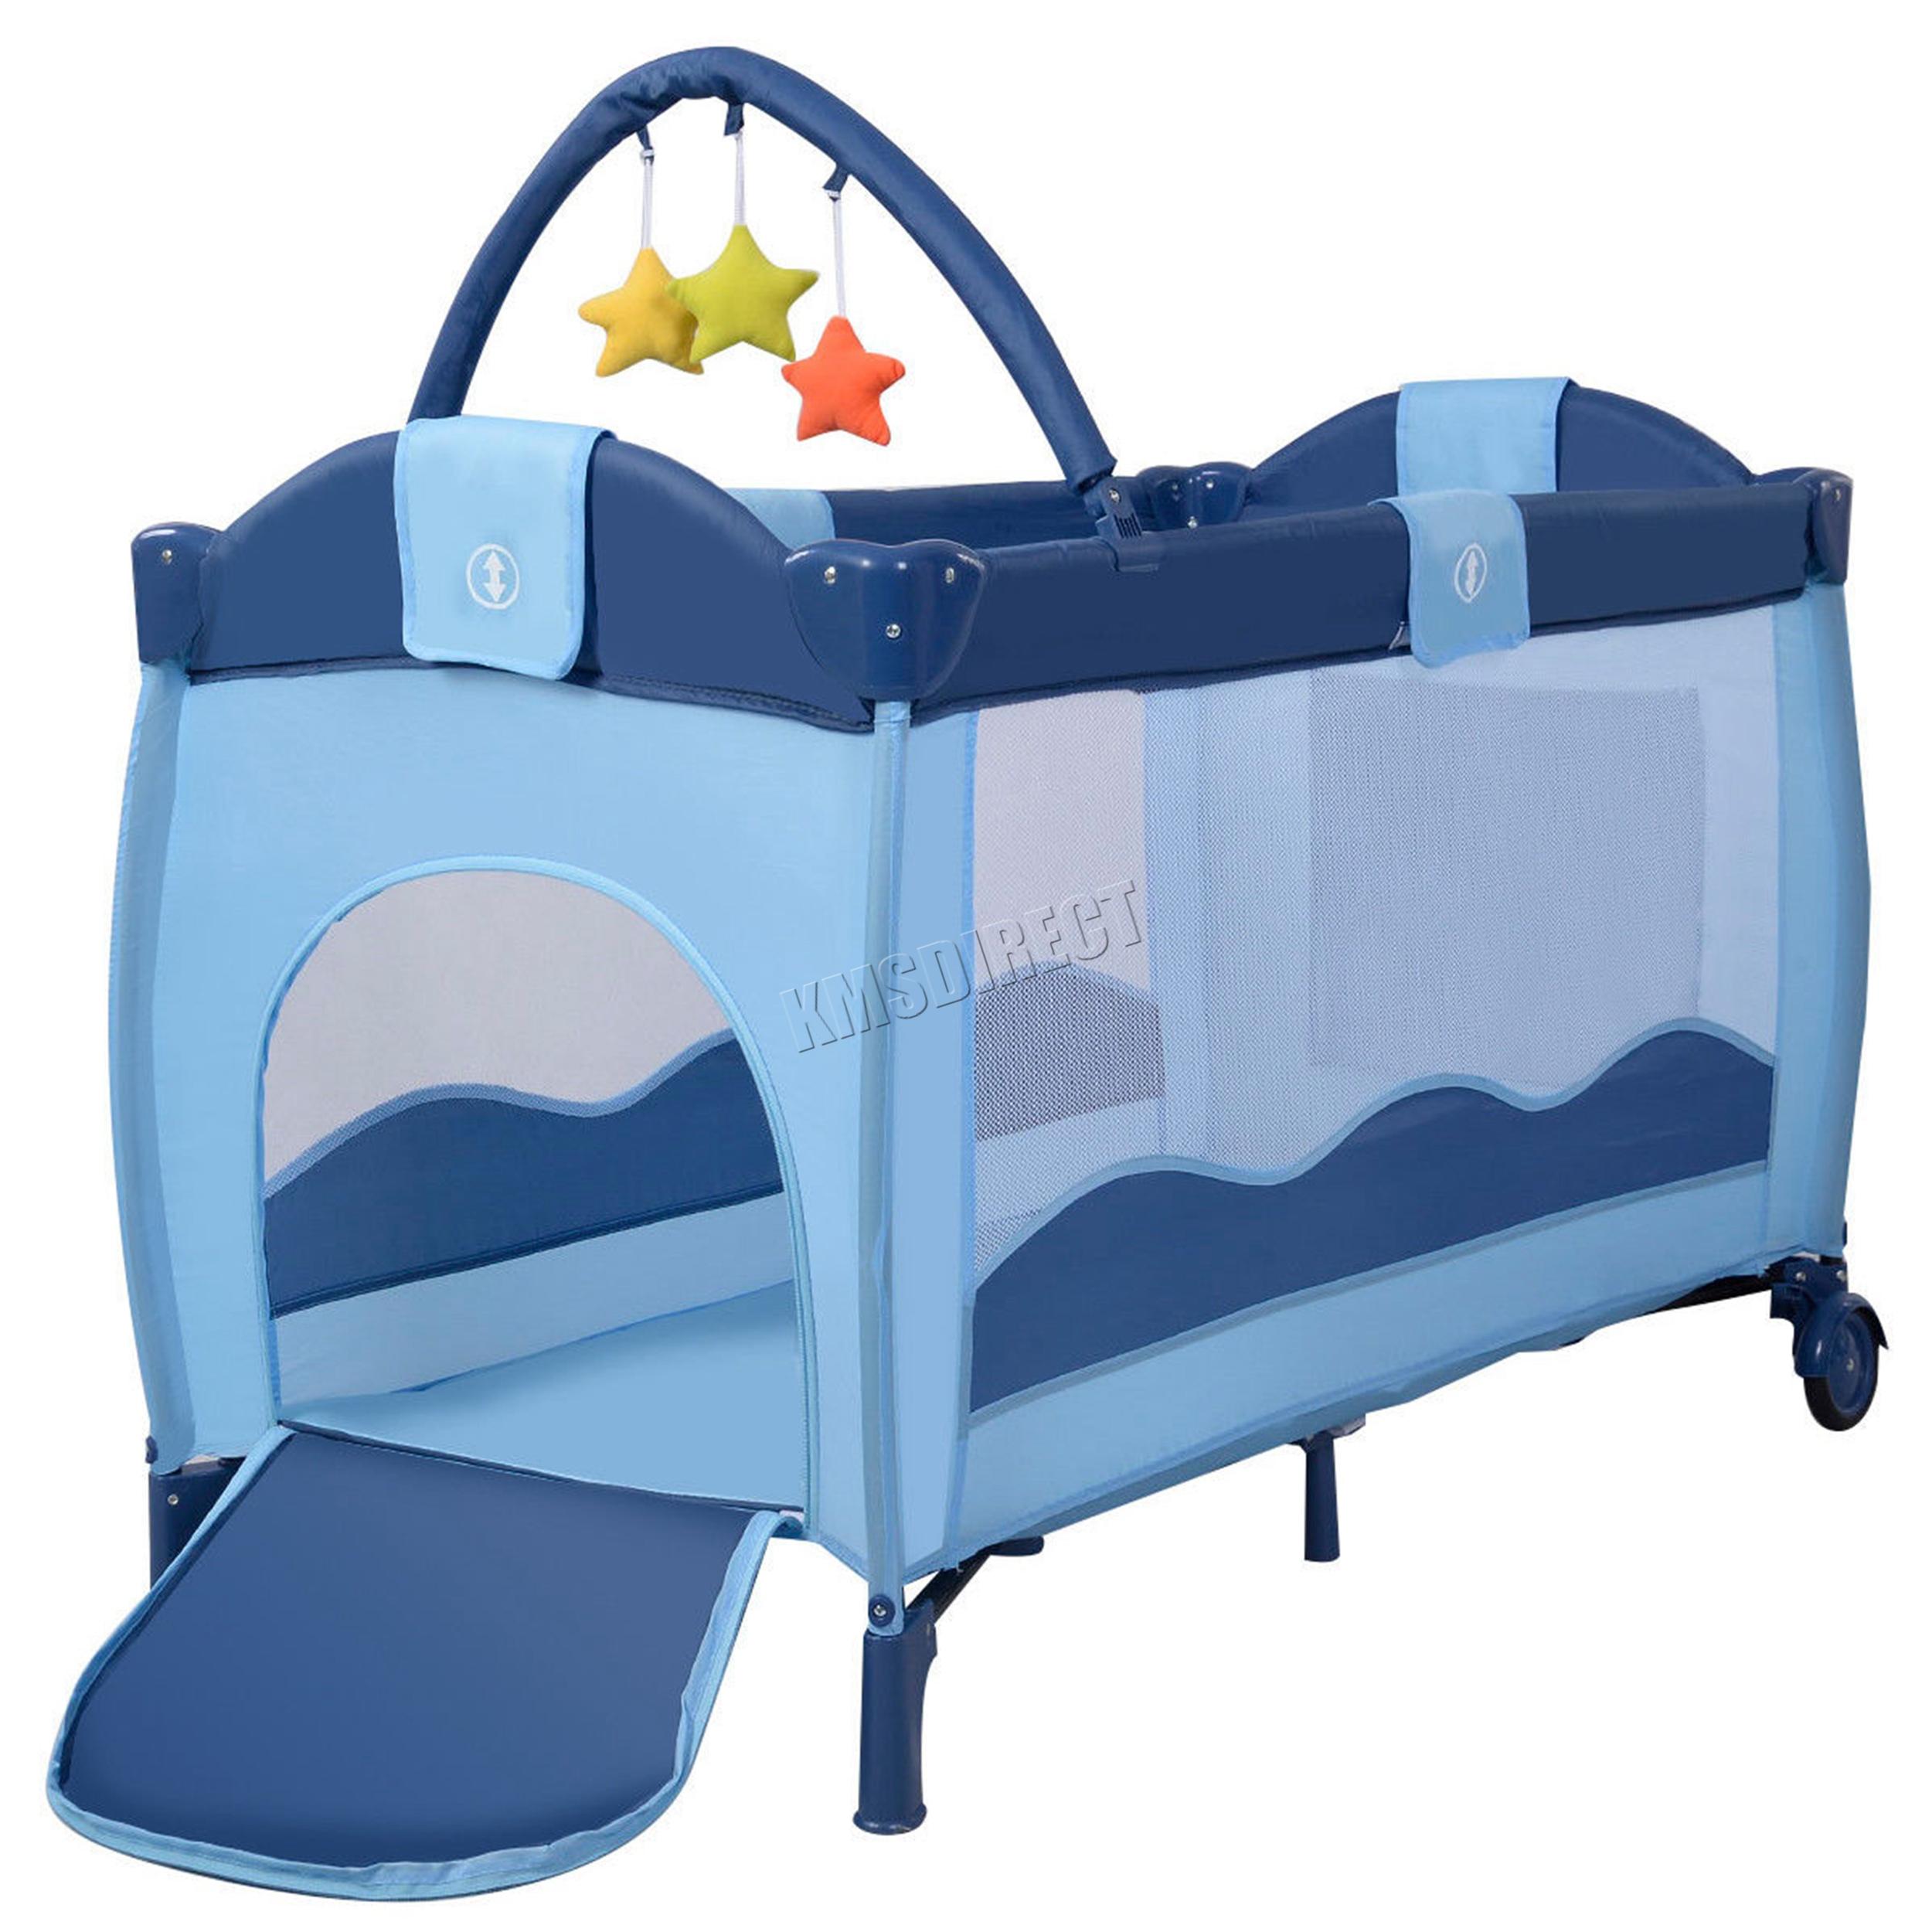 f574037de Sentinel FoxHunter Portable Baby Travel Cot Bed Kids Infant Playpen  Bassinet BCB01